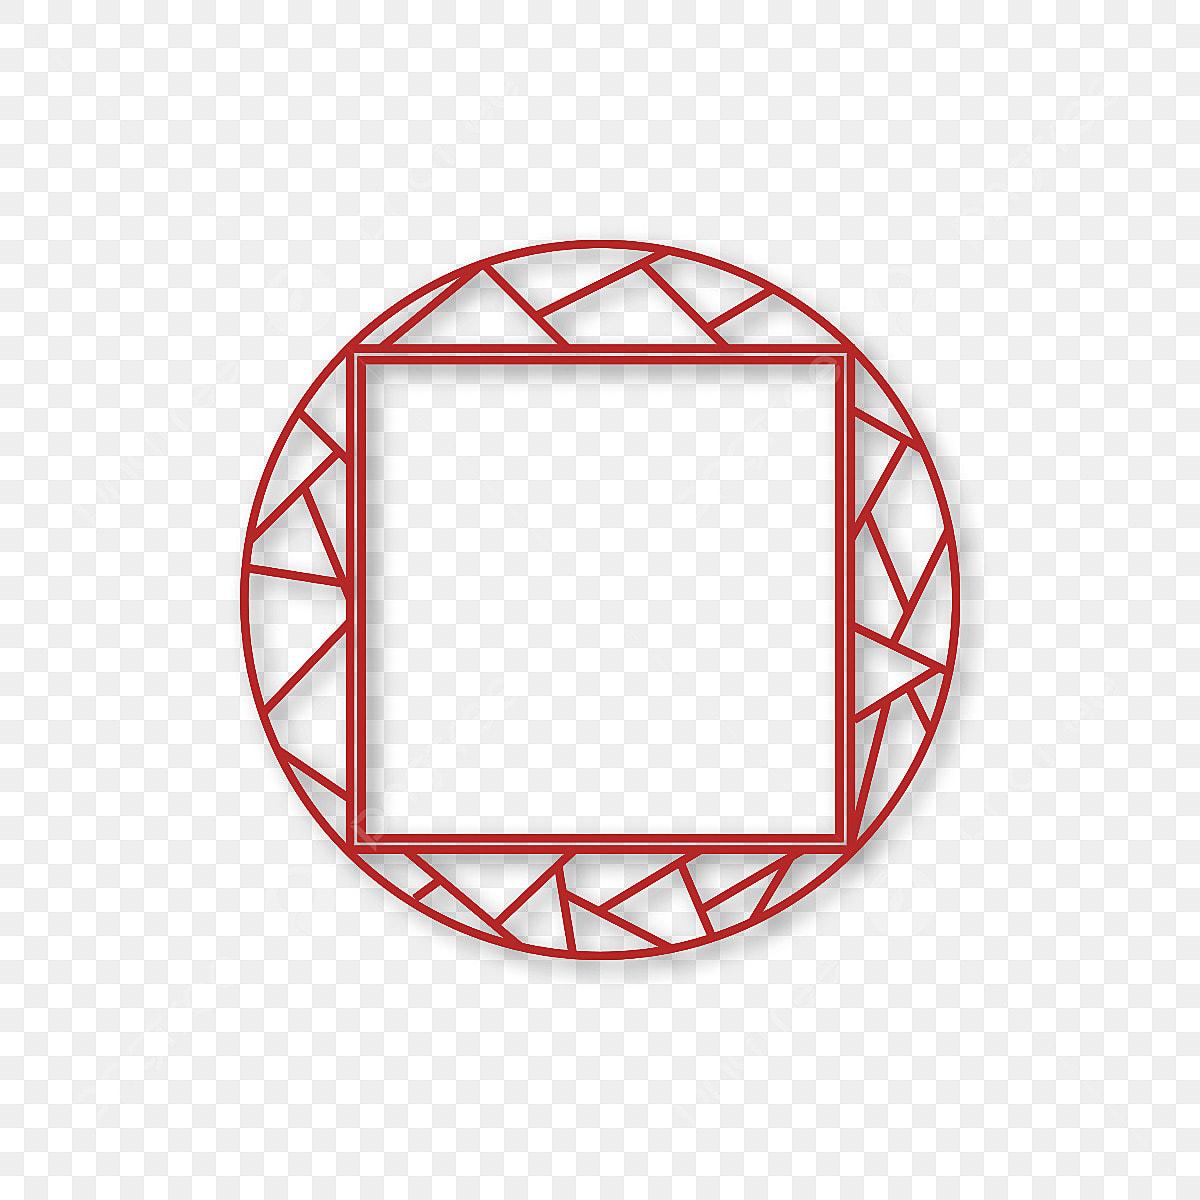 فرح تداخل متصل إطار دائري للتصميم ذهبي Dsvdedommel Com